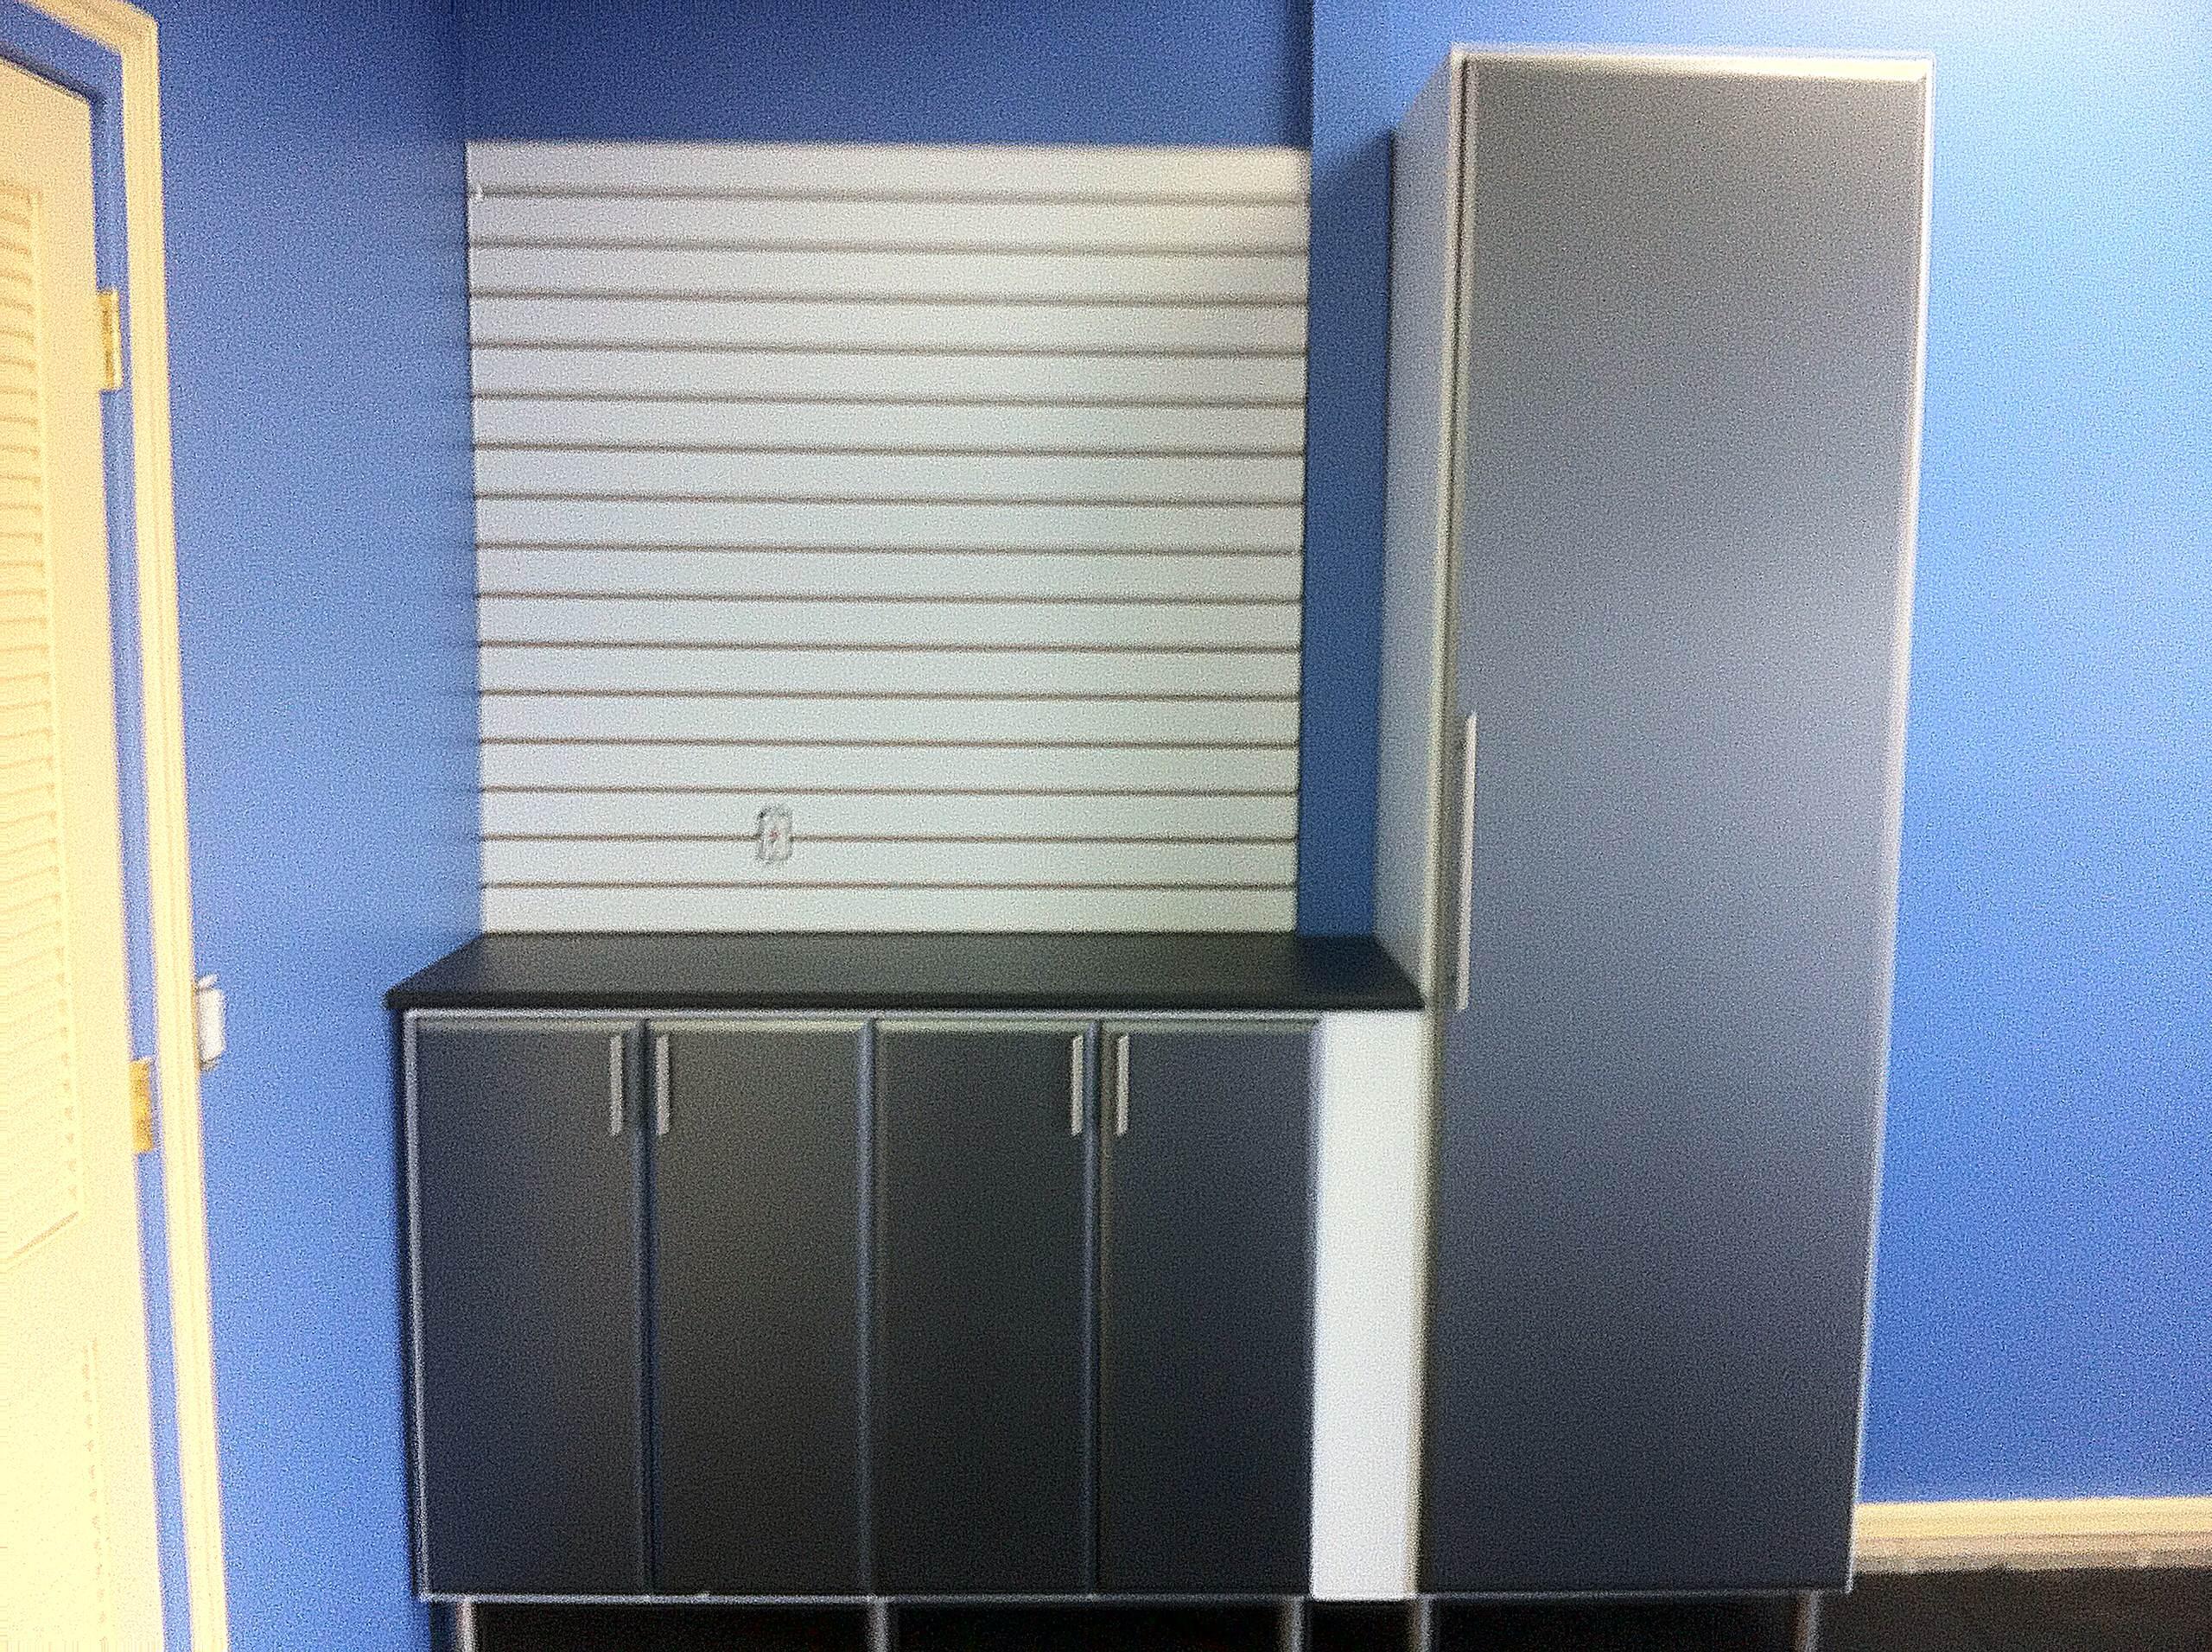 Garage Cabinets with Carbon Fiber doors